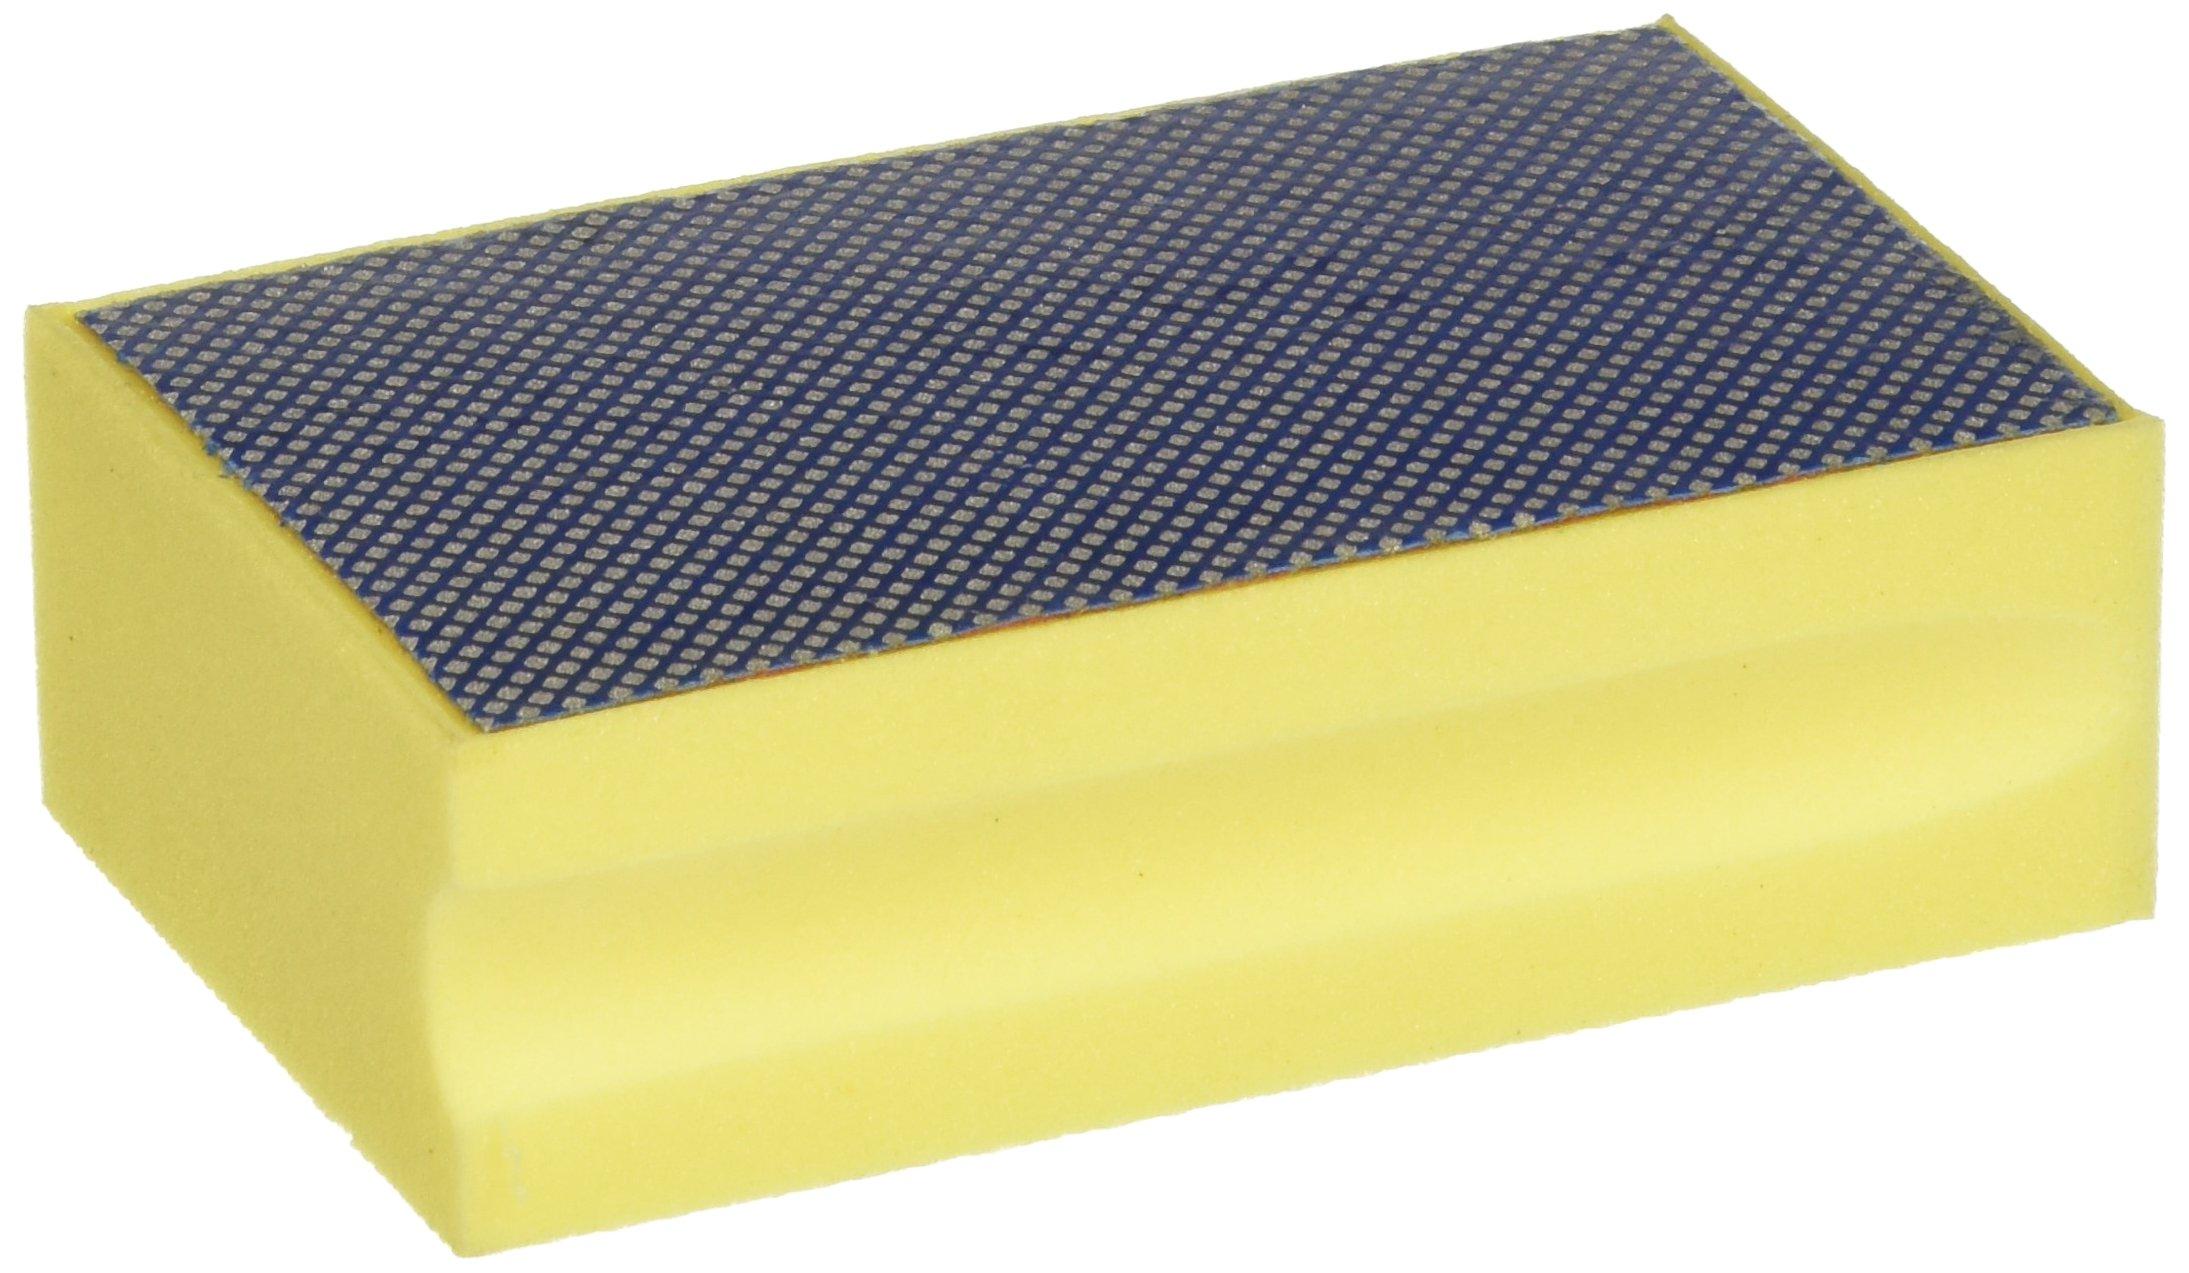 MK Diamond 159053 400 Grit Foam Block Polishing Pad